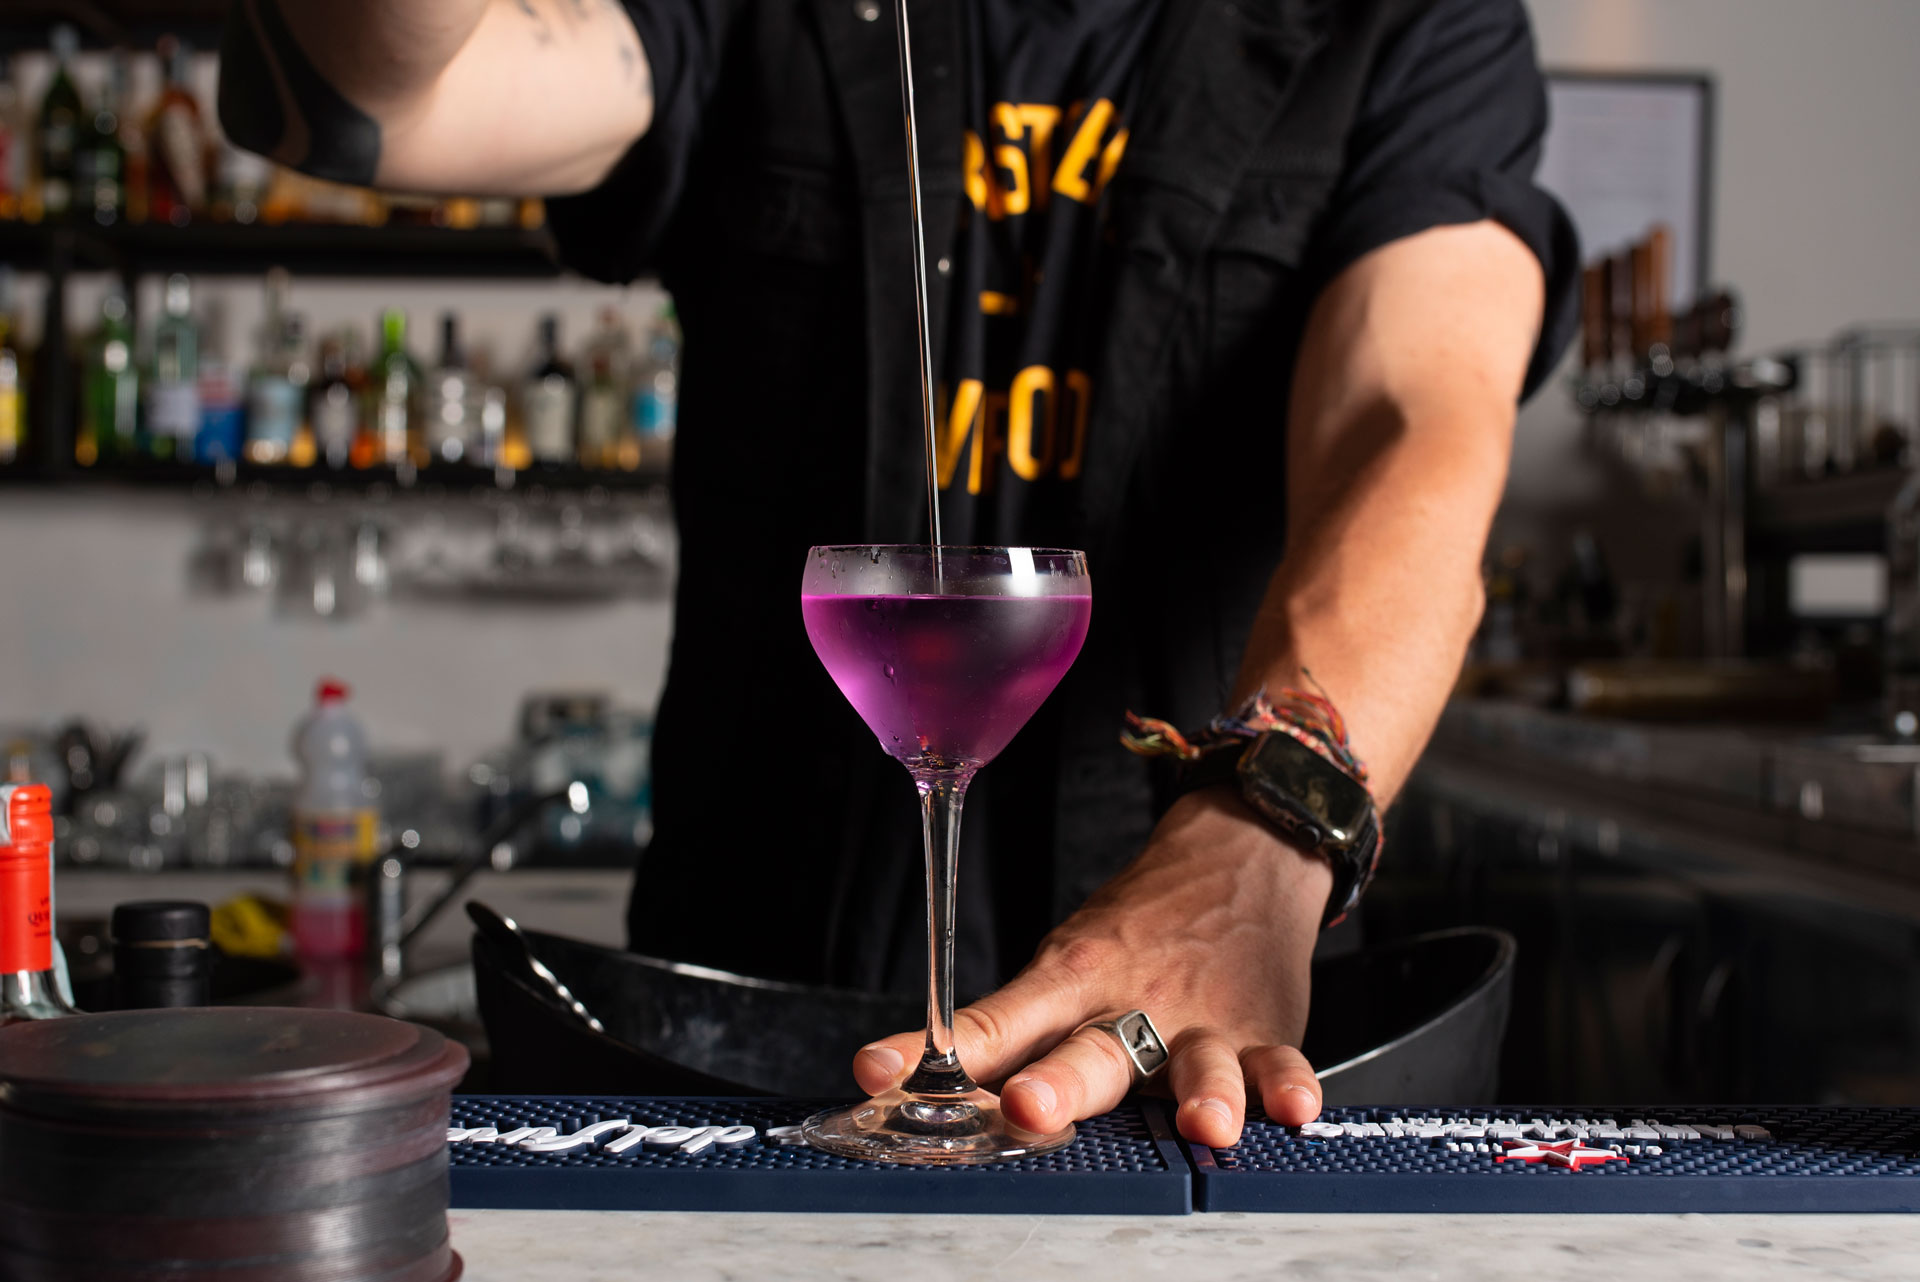 officina-visiva-lab-restaurant-riccardo-rosii-freni-e-frizioni-evento-drink-photographer-03